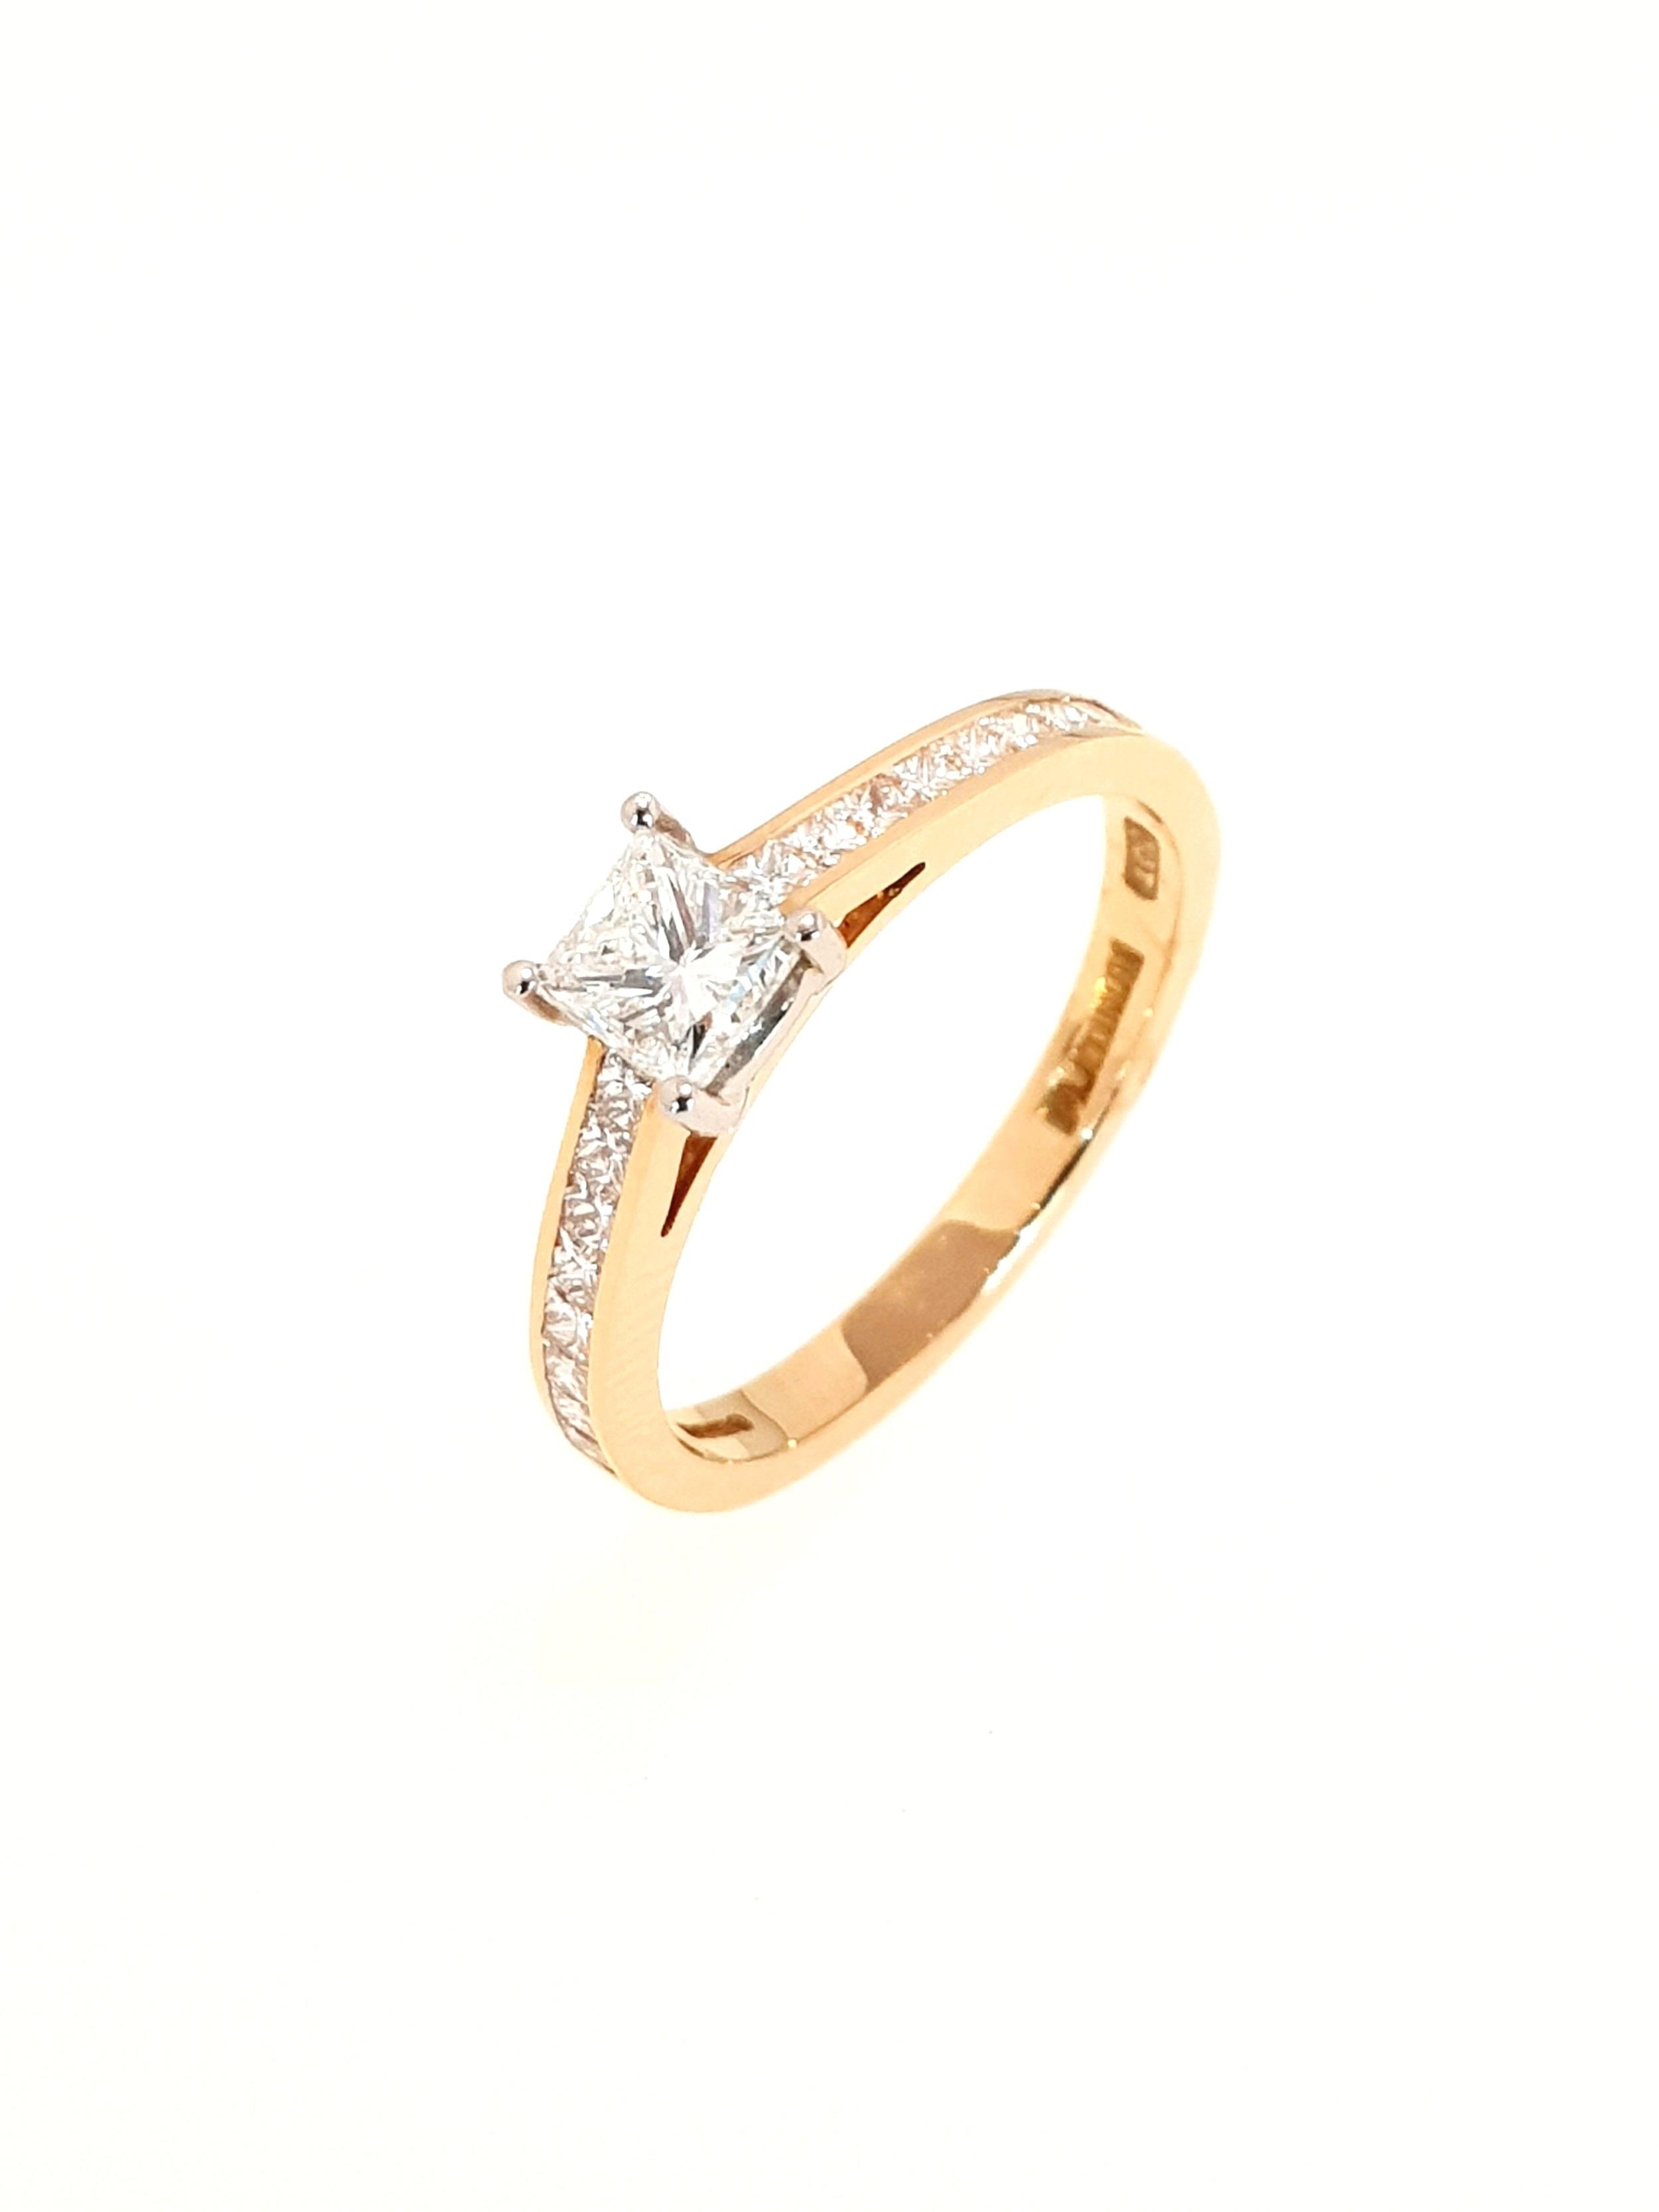 18ct Rose Gold Diamond Ring, Princess Cut  .39ct, G, Si1  Stock Code: N8729  £2700